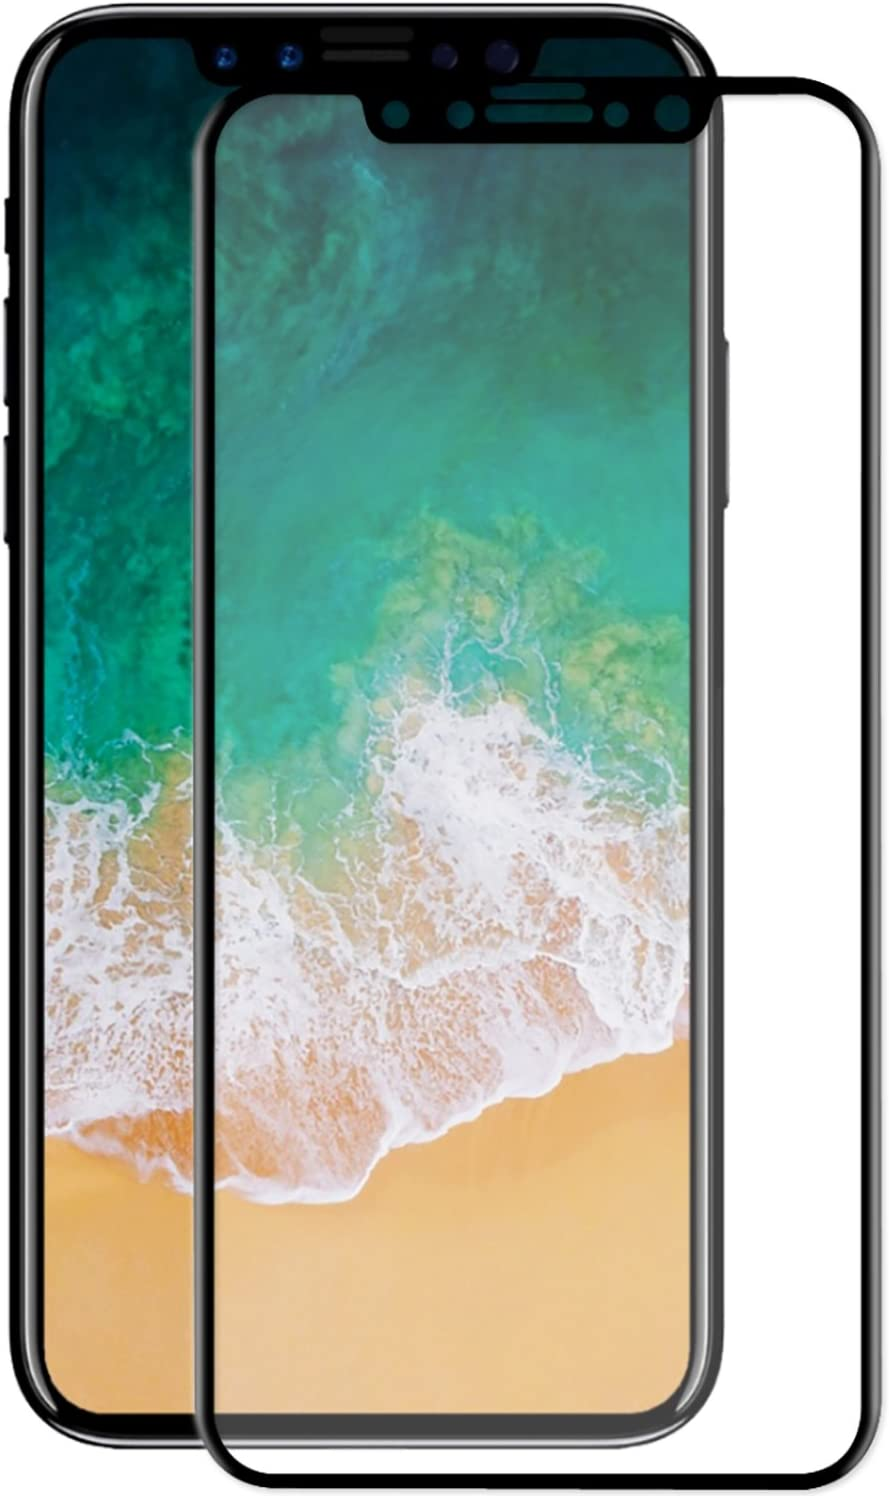 TheSmartGuard Panzerglas kompatibel mit iPhone 8//7 Panzerglasfolie Gebogene Kanten in Gold Vollst/ändiger Schutz 4,7 Zoll Full Screen Tempered Glass